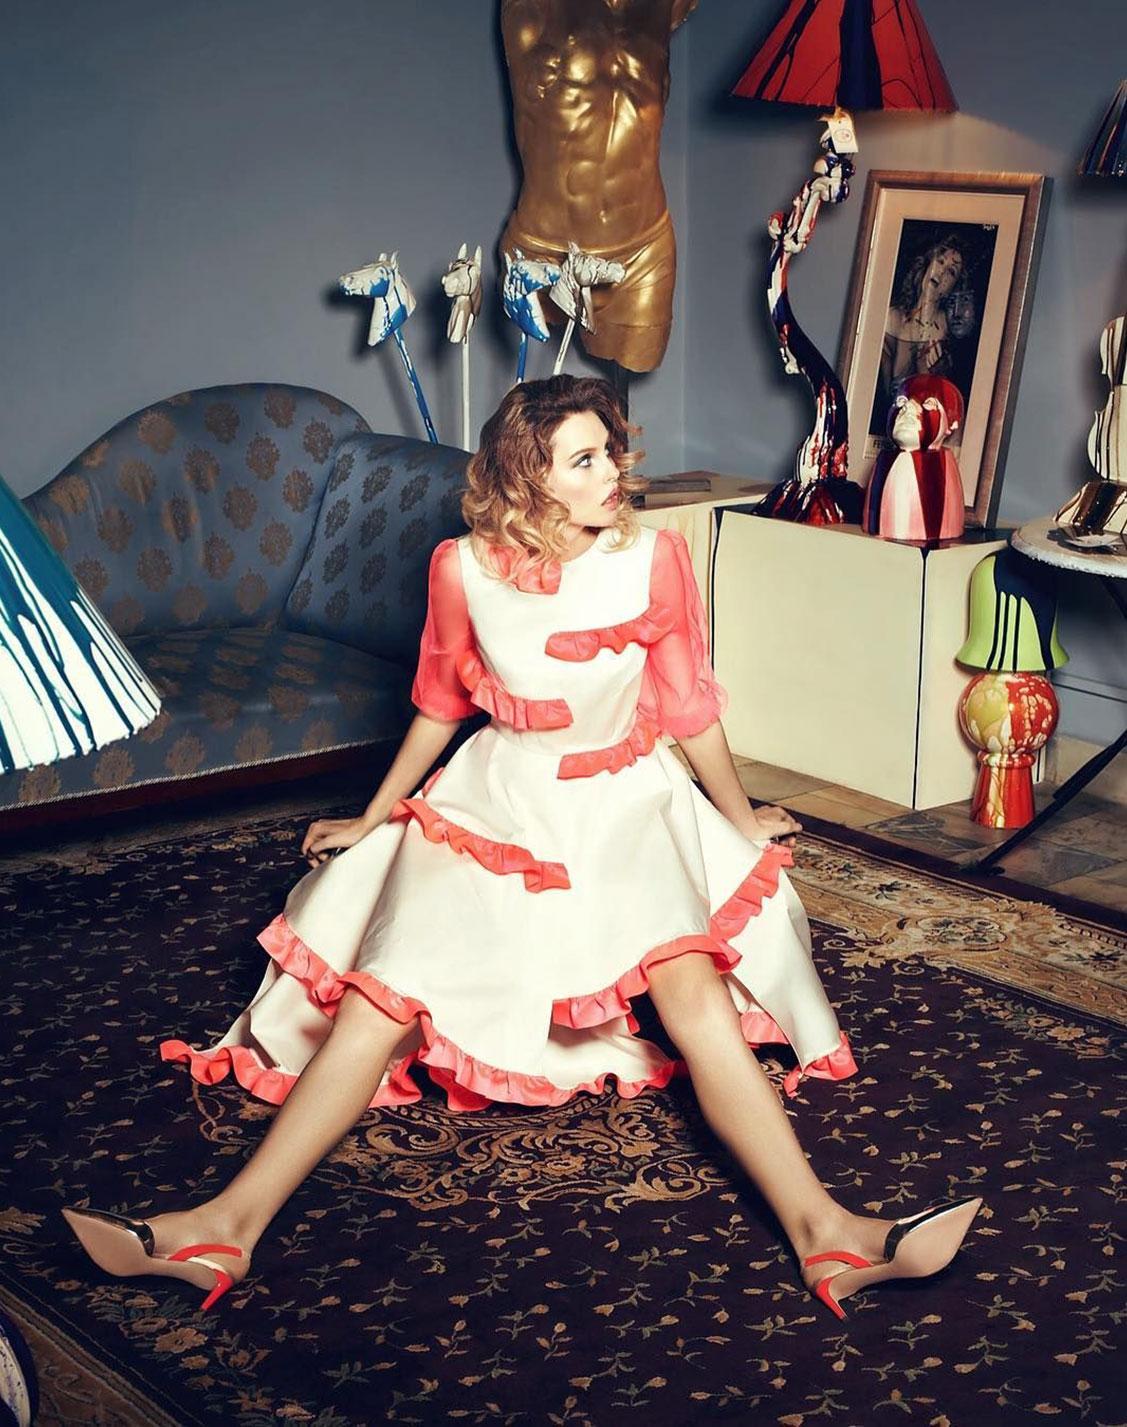 Антонина Ермолина в рекламной кампании модного бренда Au Pont Rouge, весна-лето 2017 / фото 11